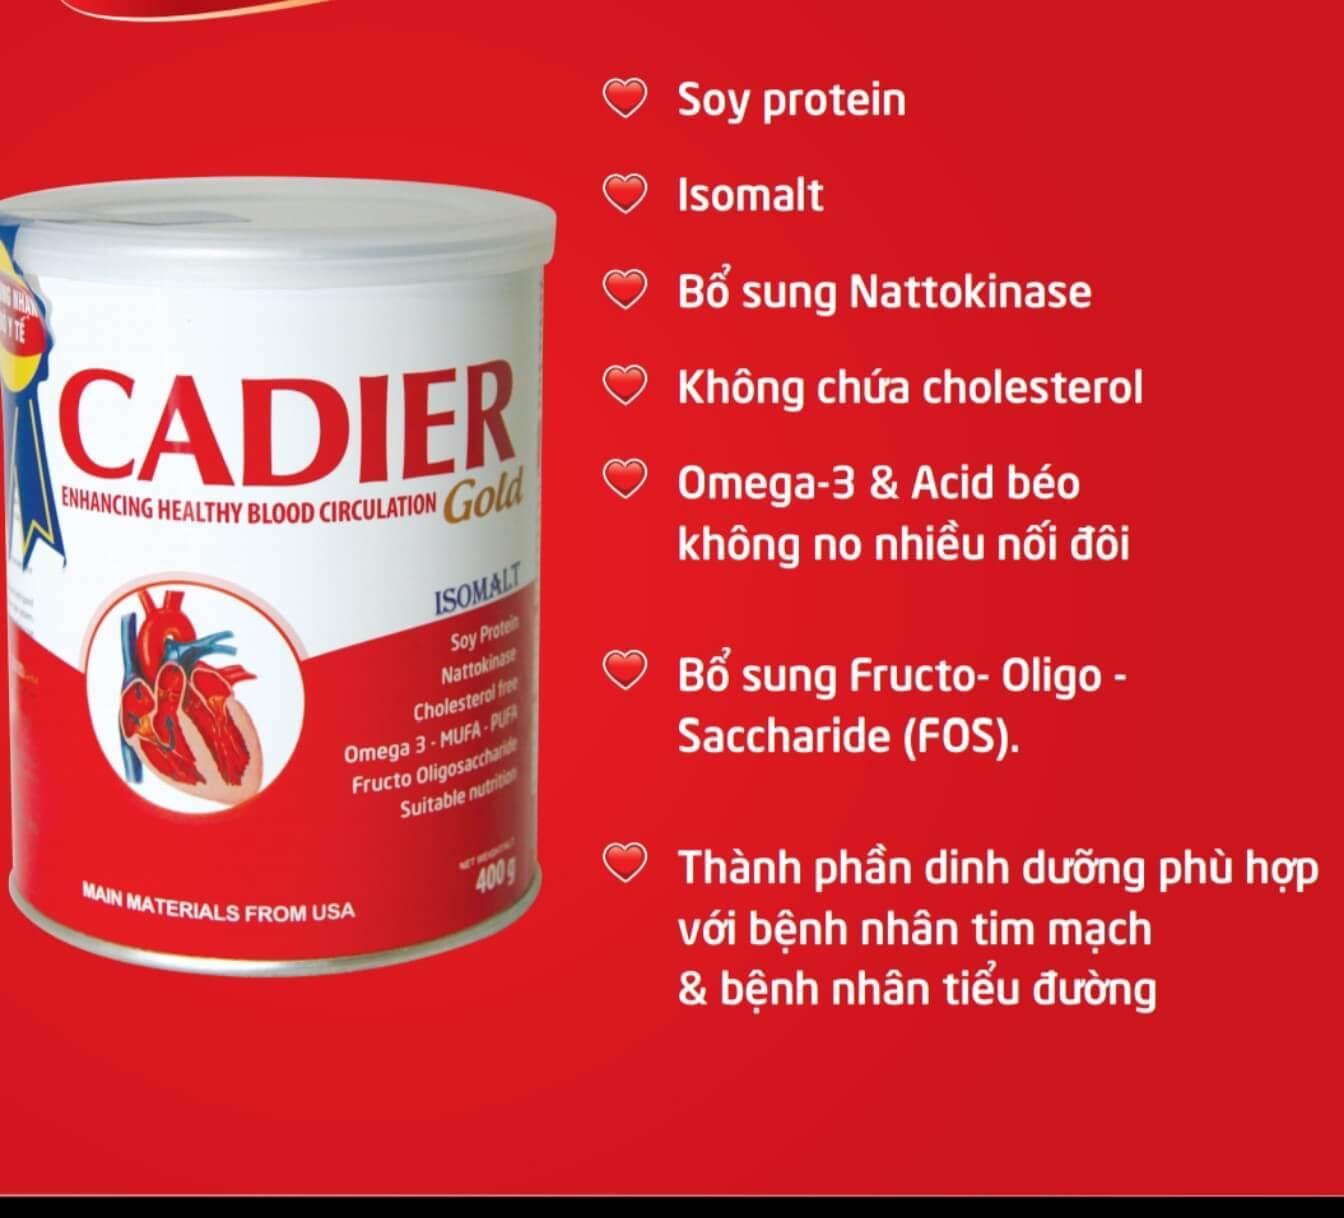 Cadier Gold